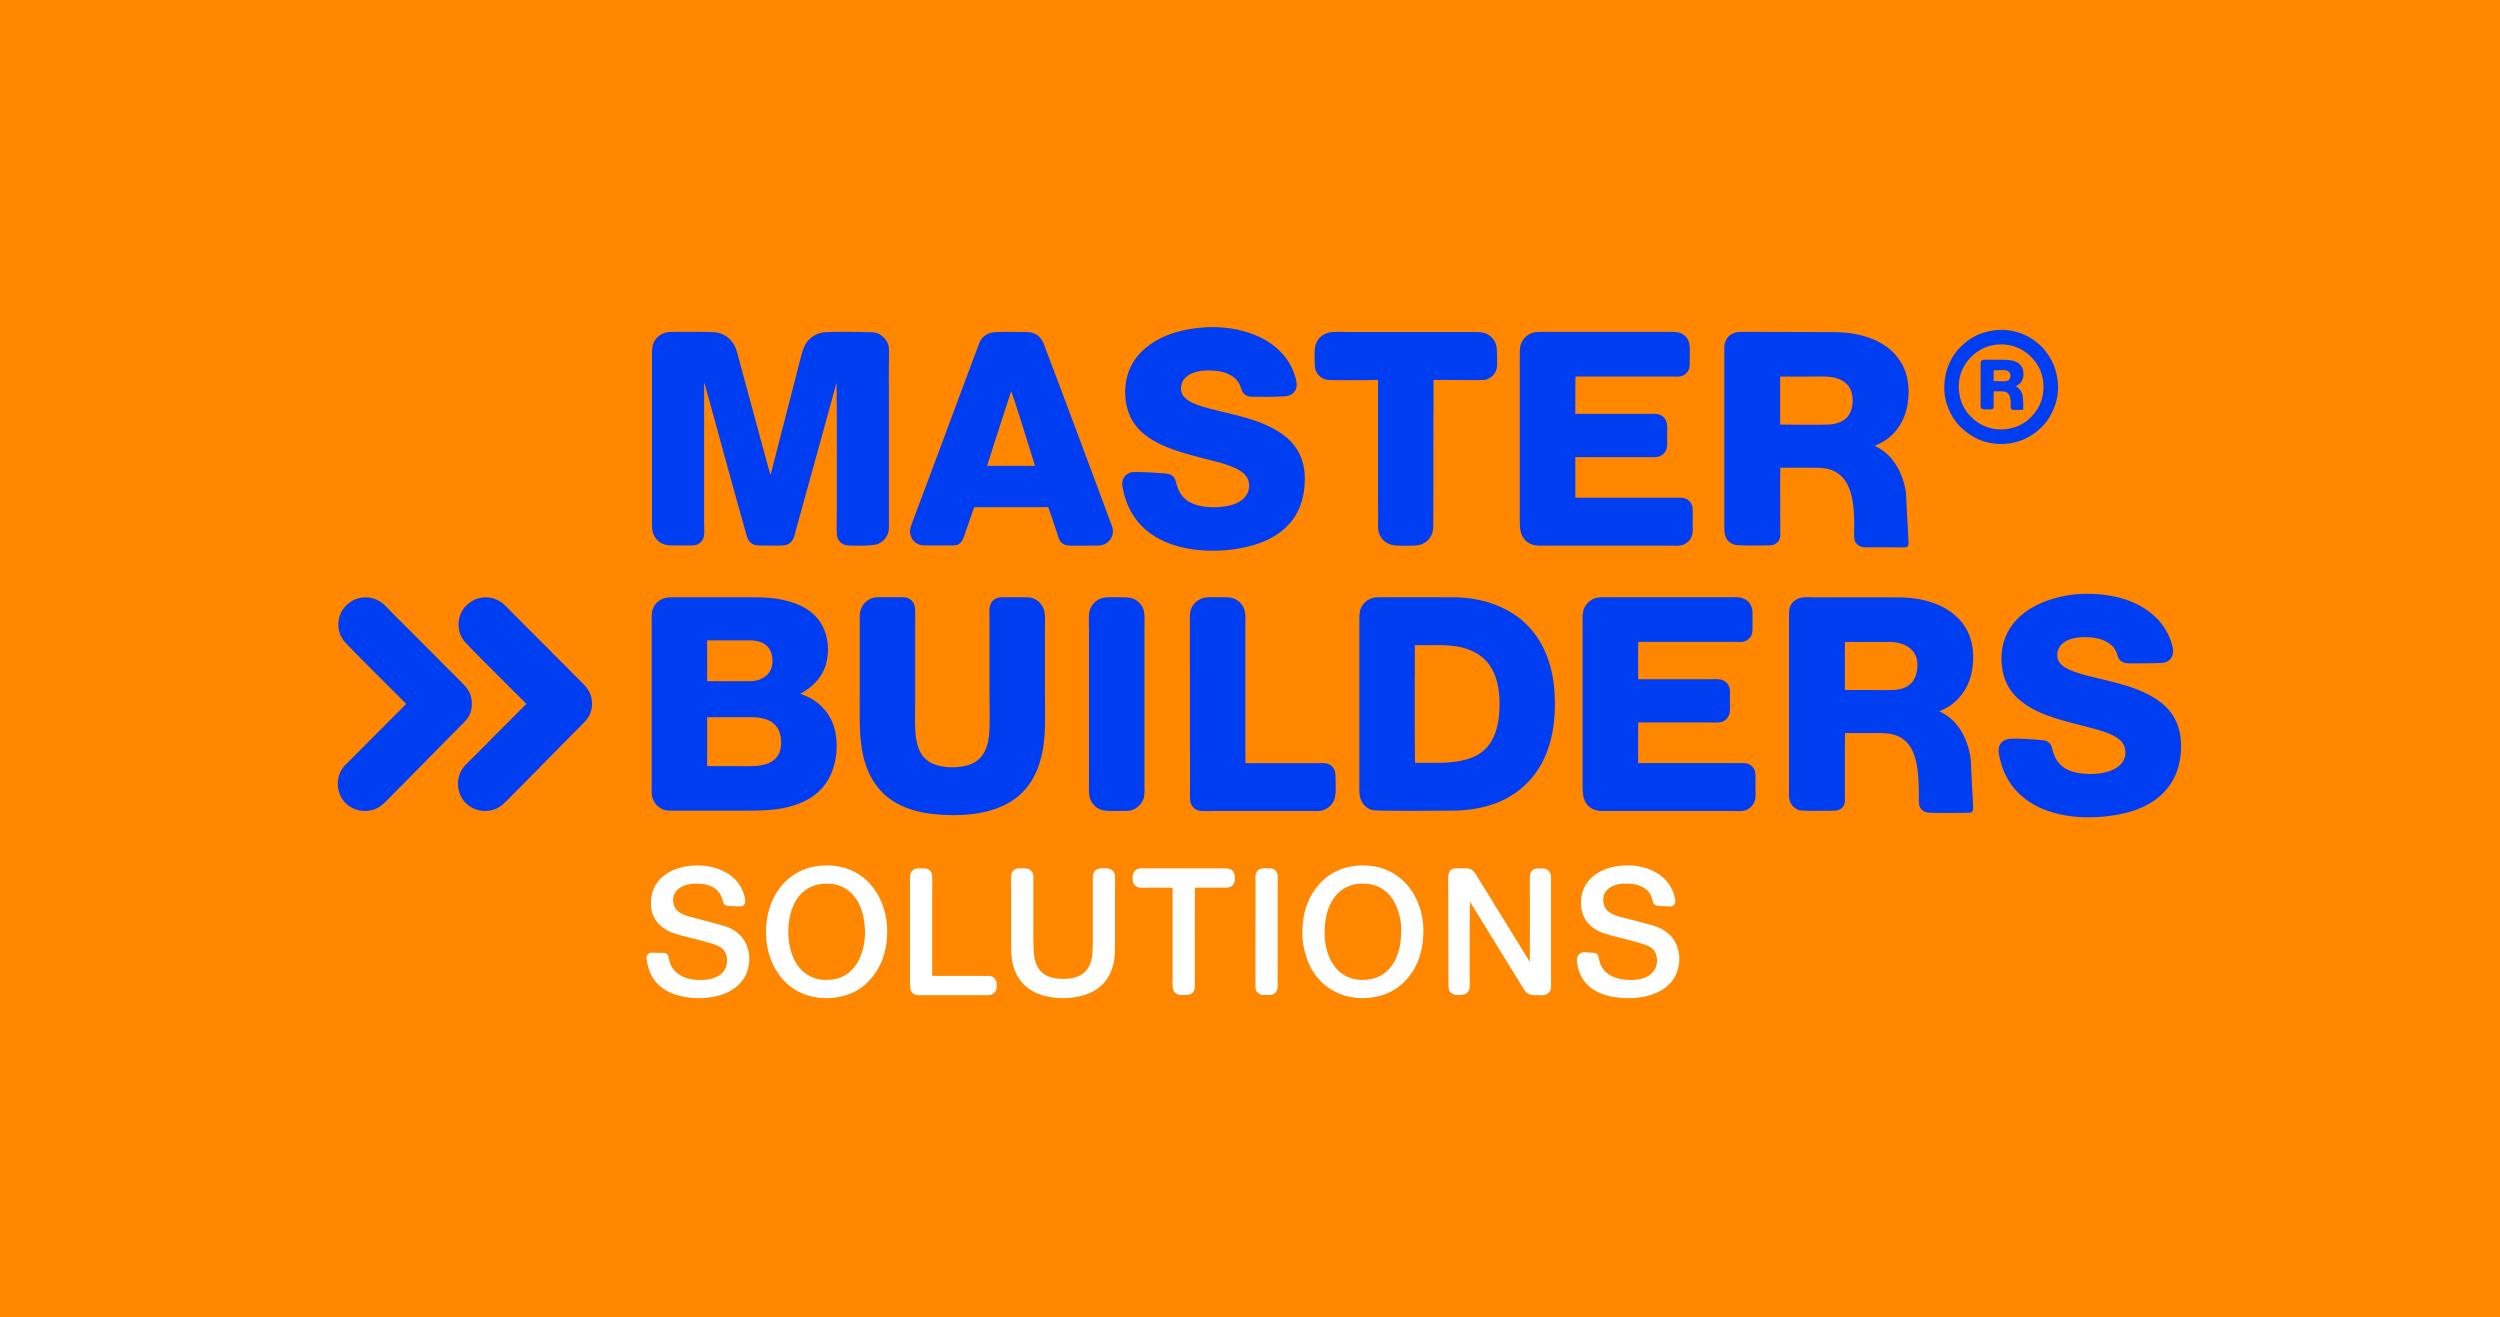 Master Builders Solutions Italia SpA